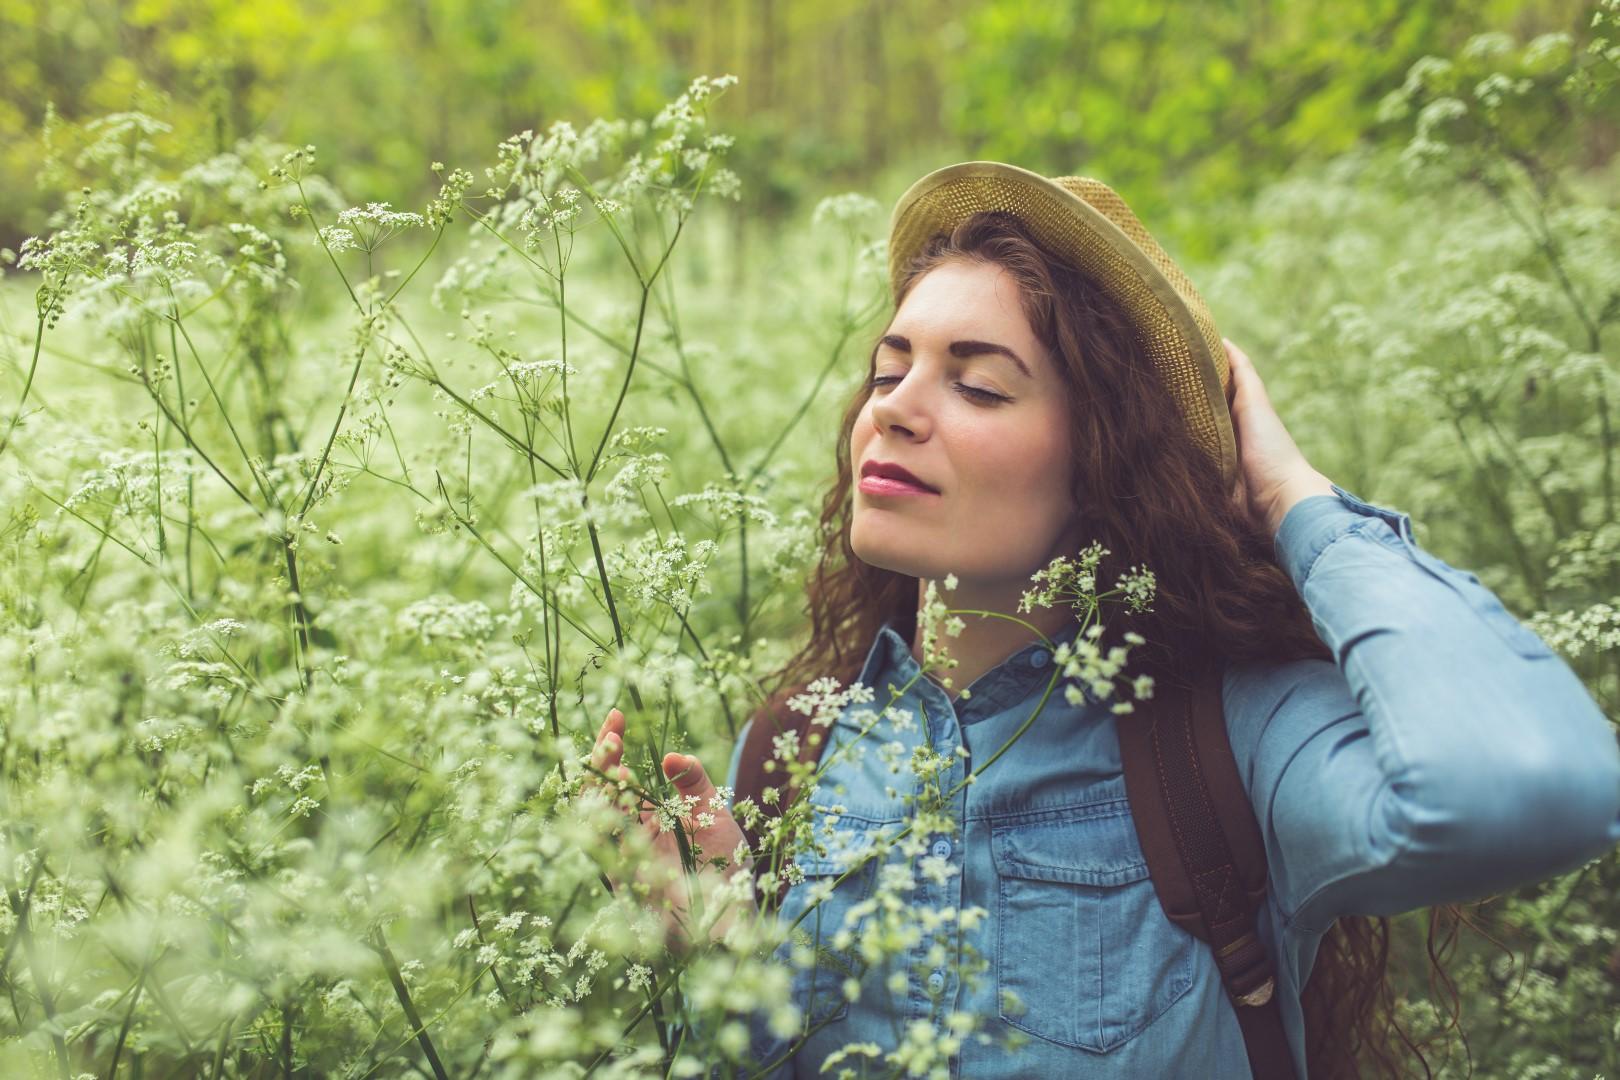 Kann man ohne Geruchssinn leben